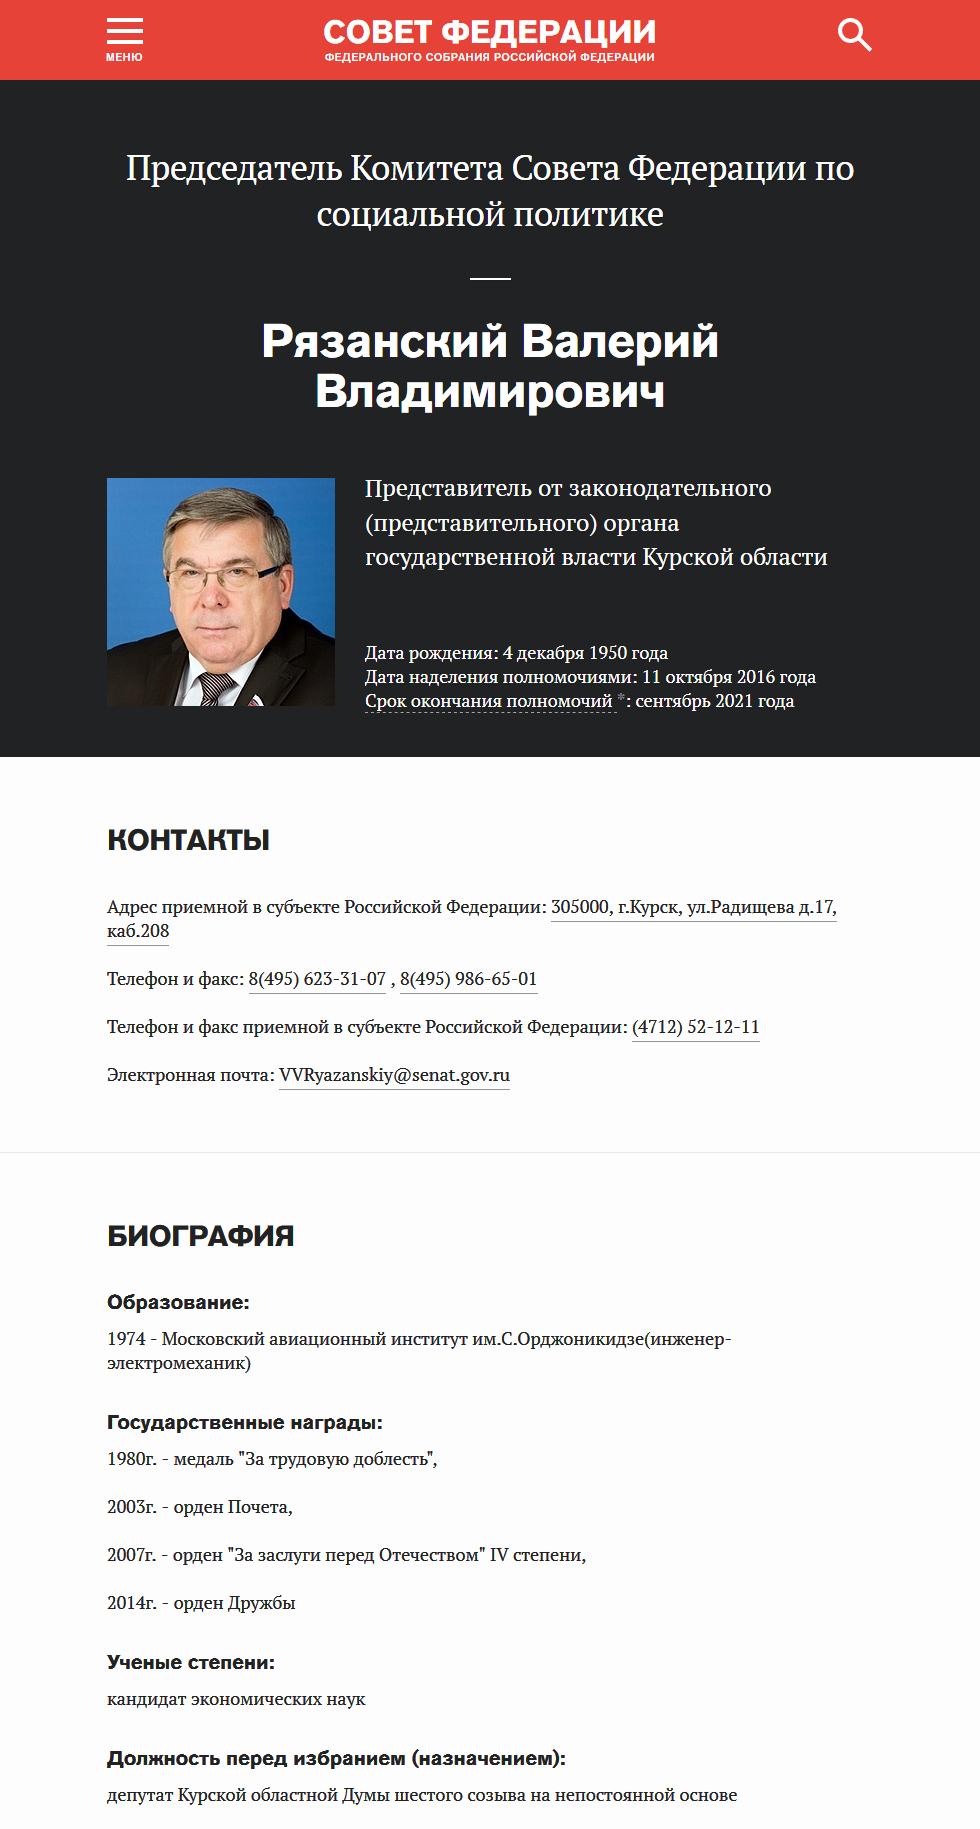 Структура I Совет Федерации Ф_ - http___council.gov.ru_structure_persons_254_